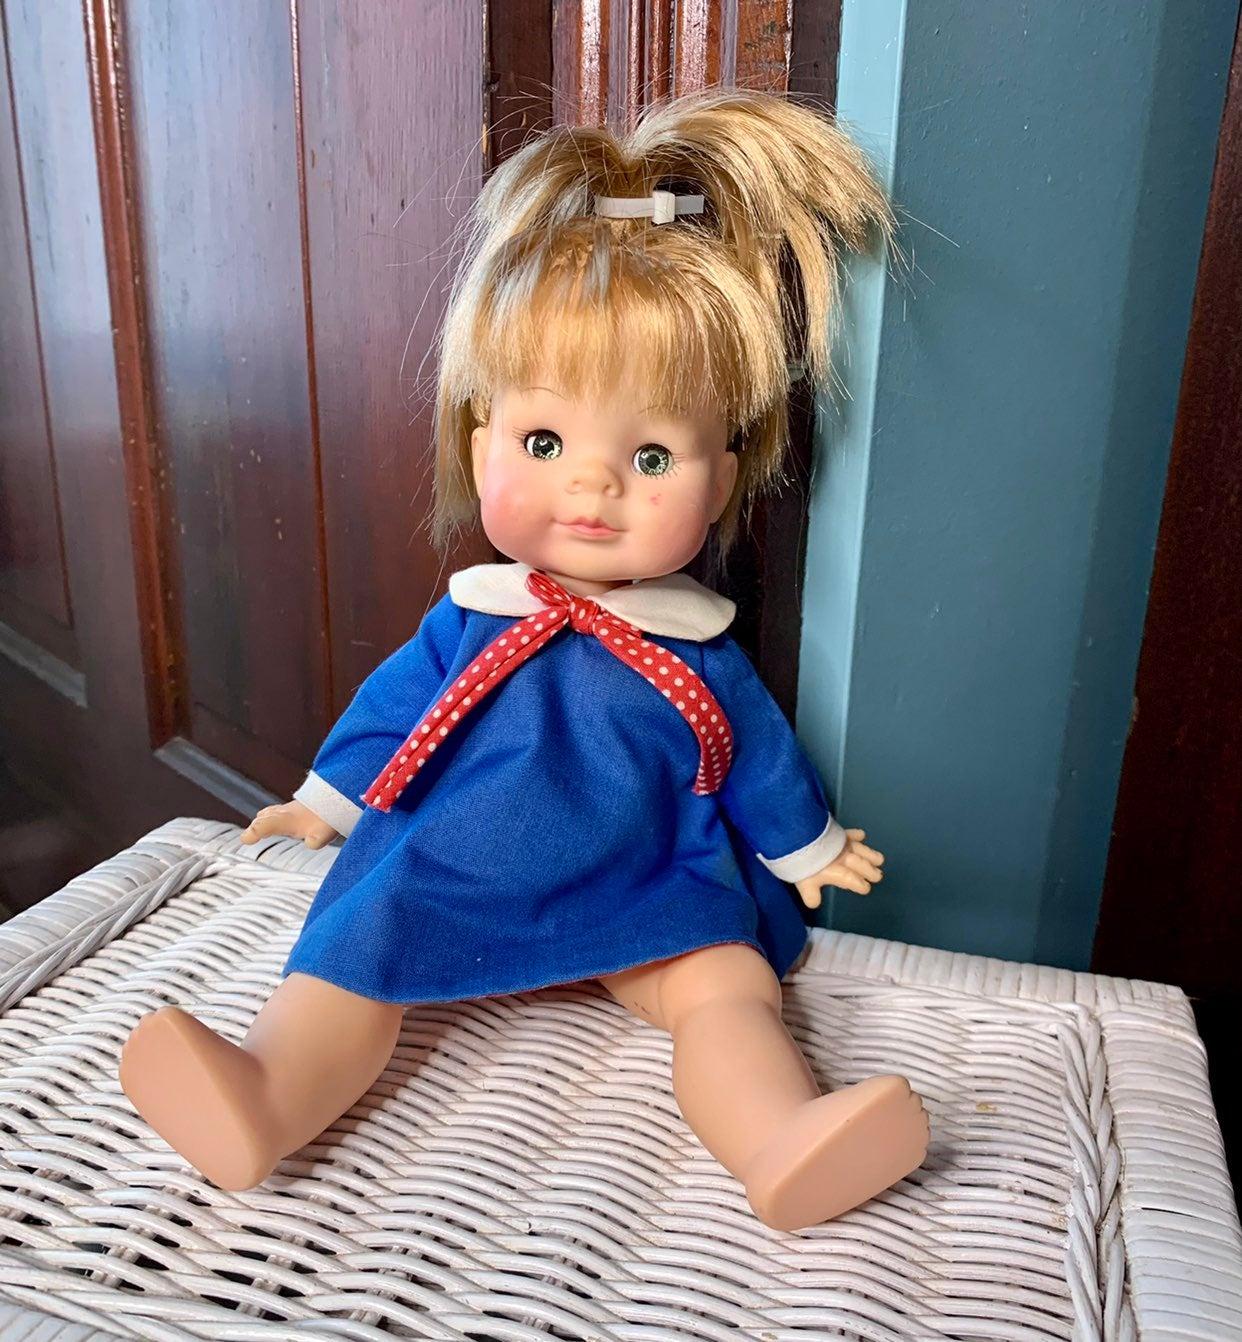 Doll vintage blond hair